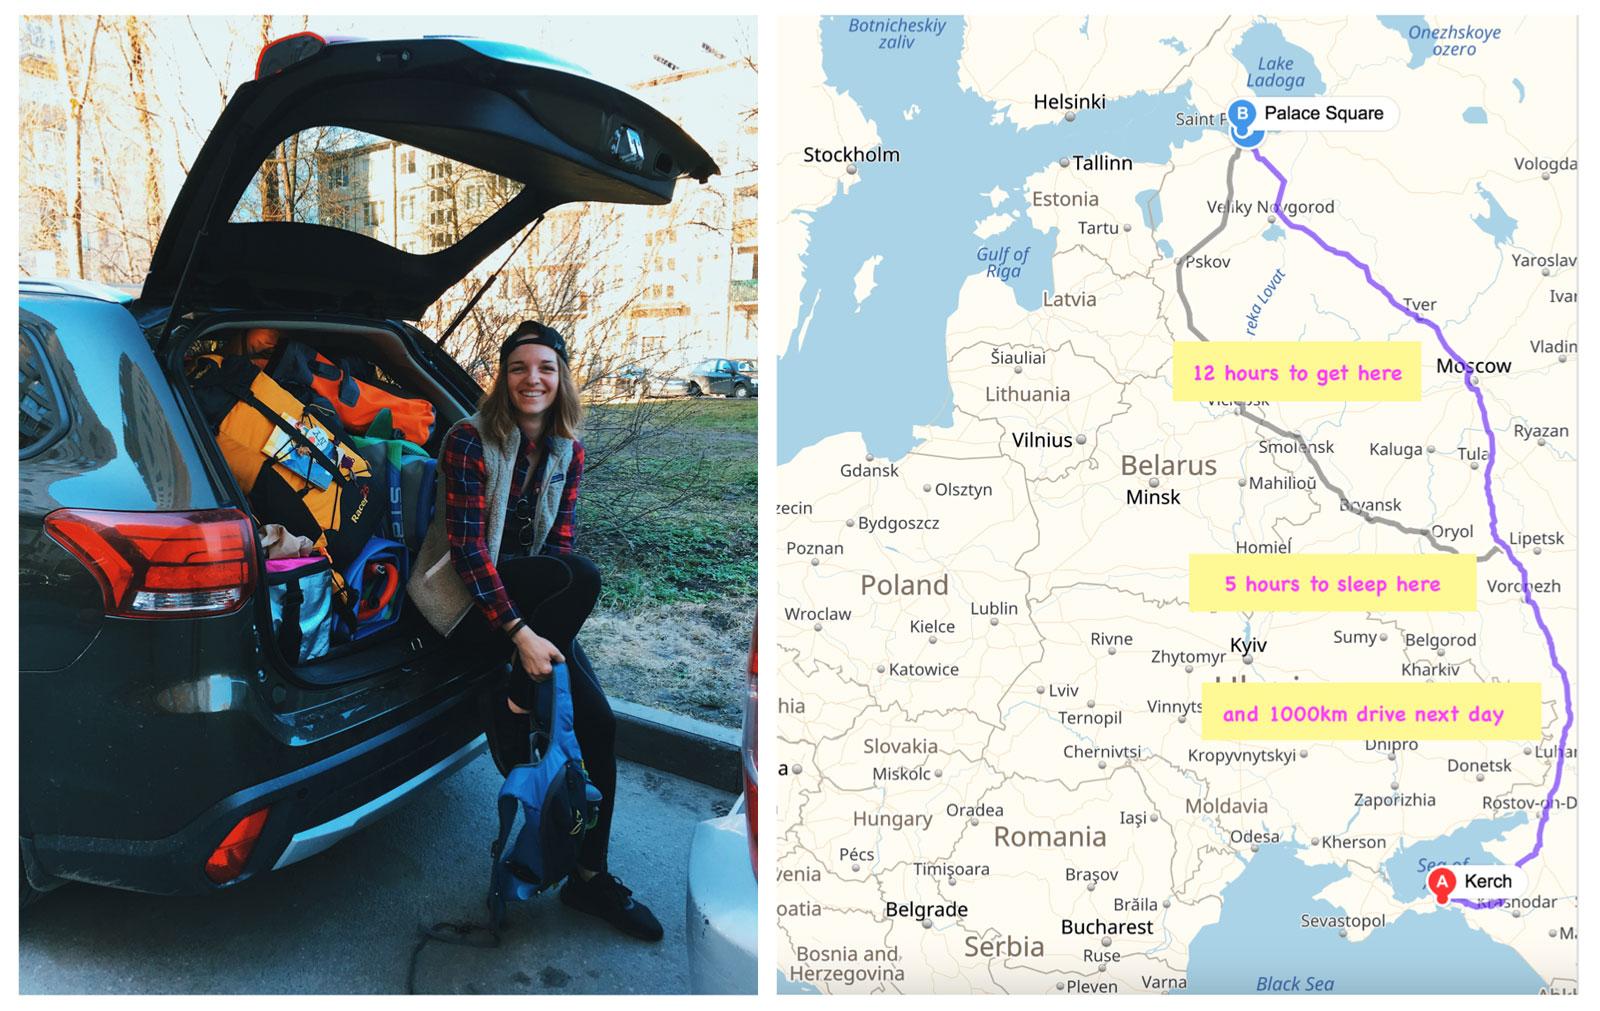 julia-karpacheva-paddleboarding-russia-black-sea-roadtrip-map